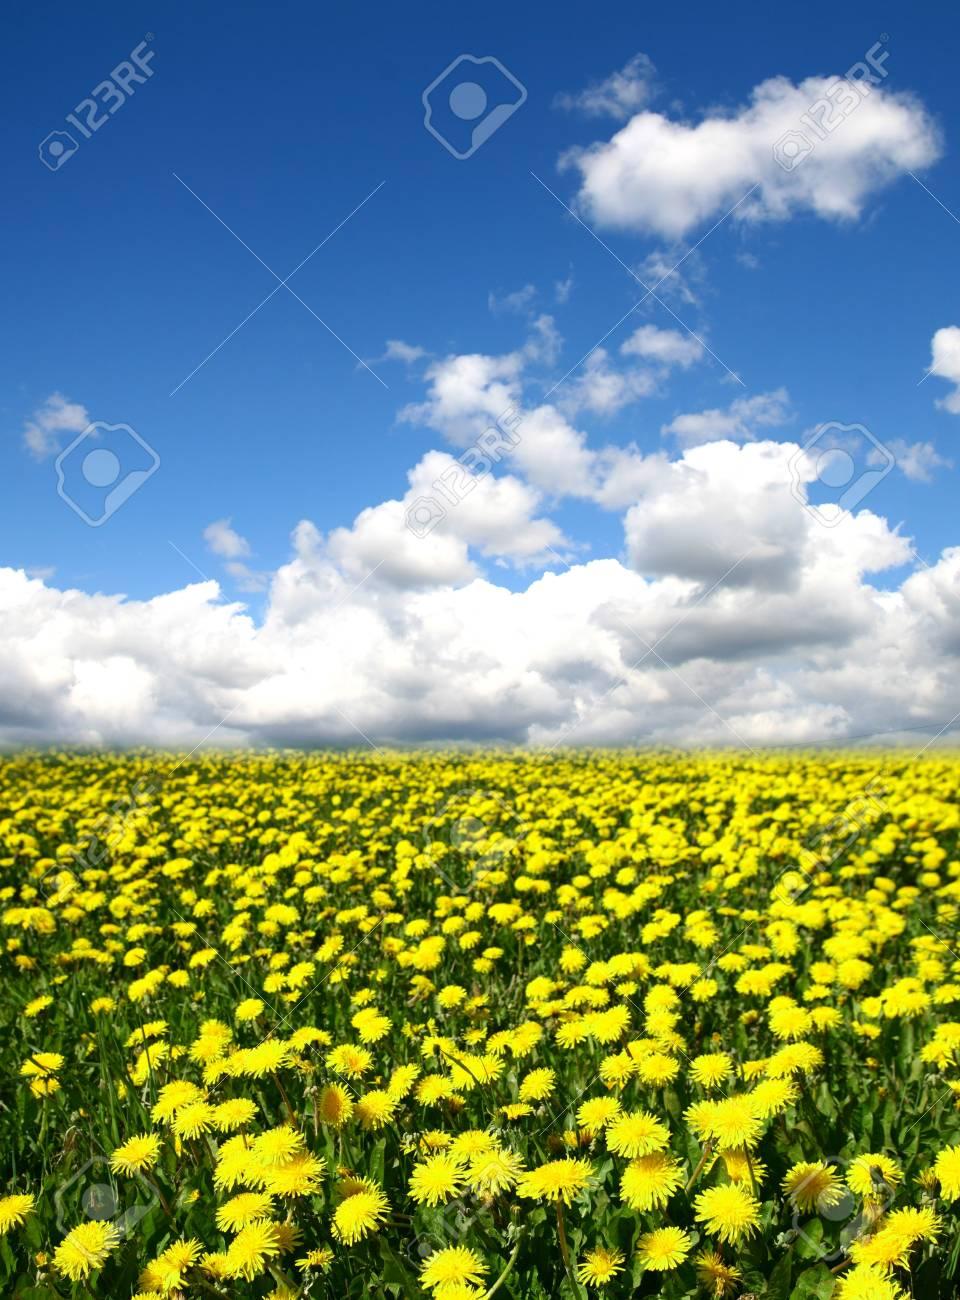 dandelion green field country landscape Stock Photo - 10459597